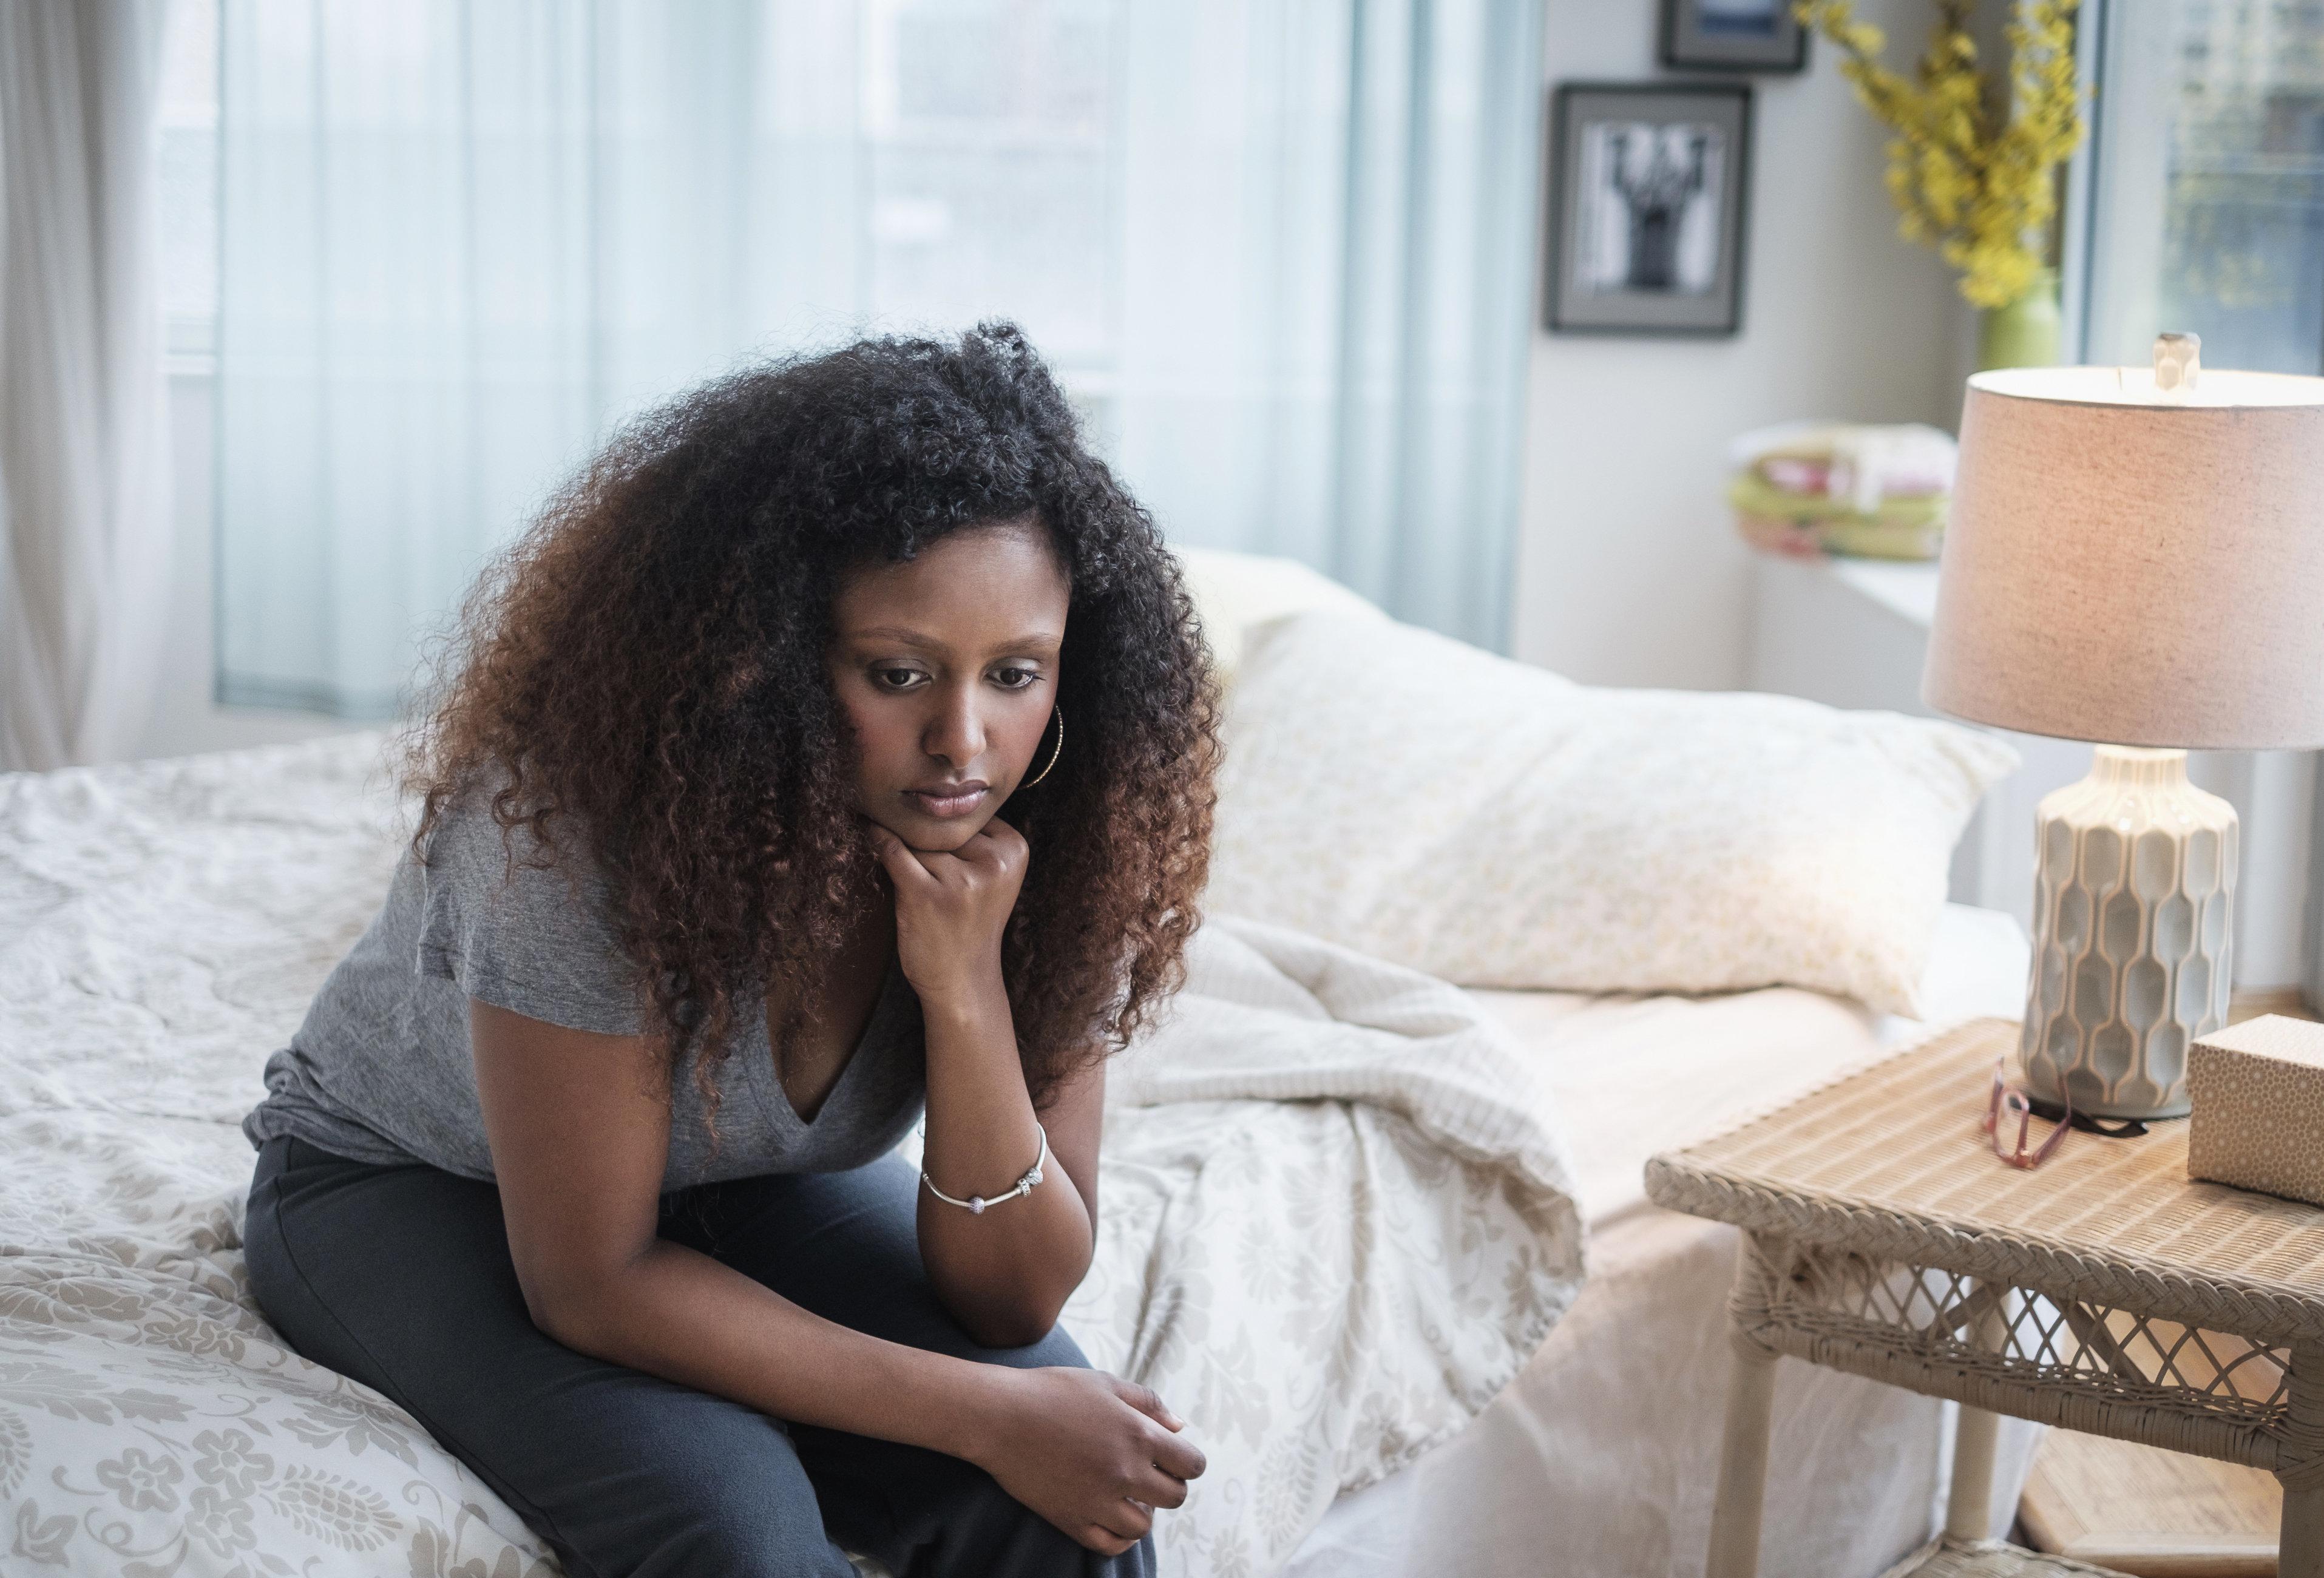 Sad Black woman sitting on bed